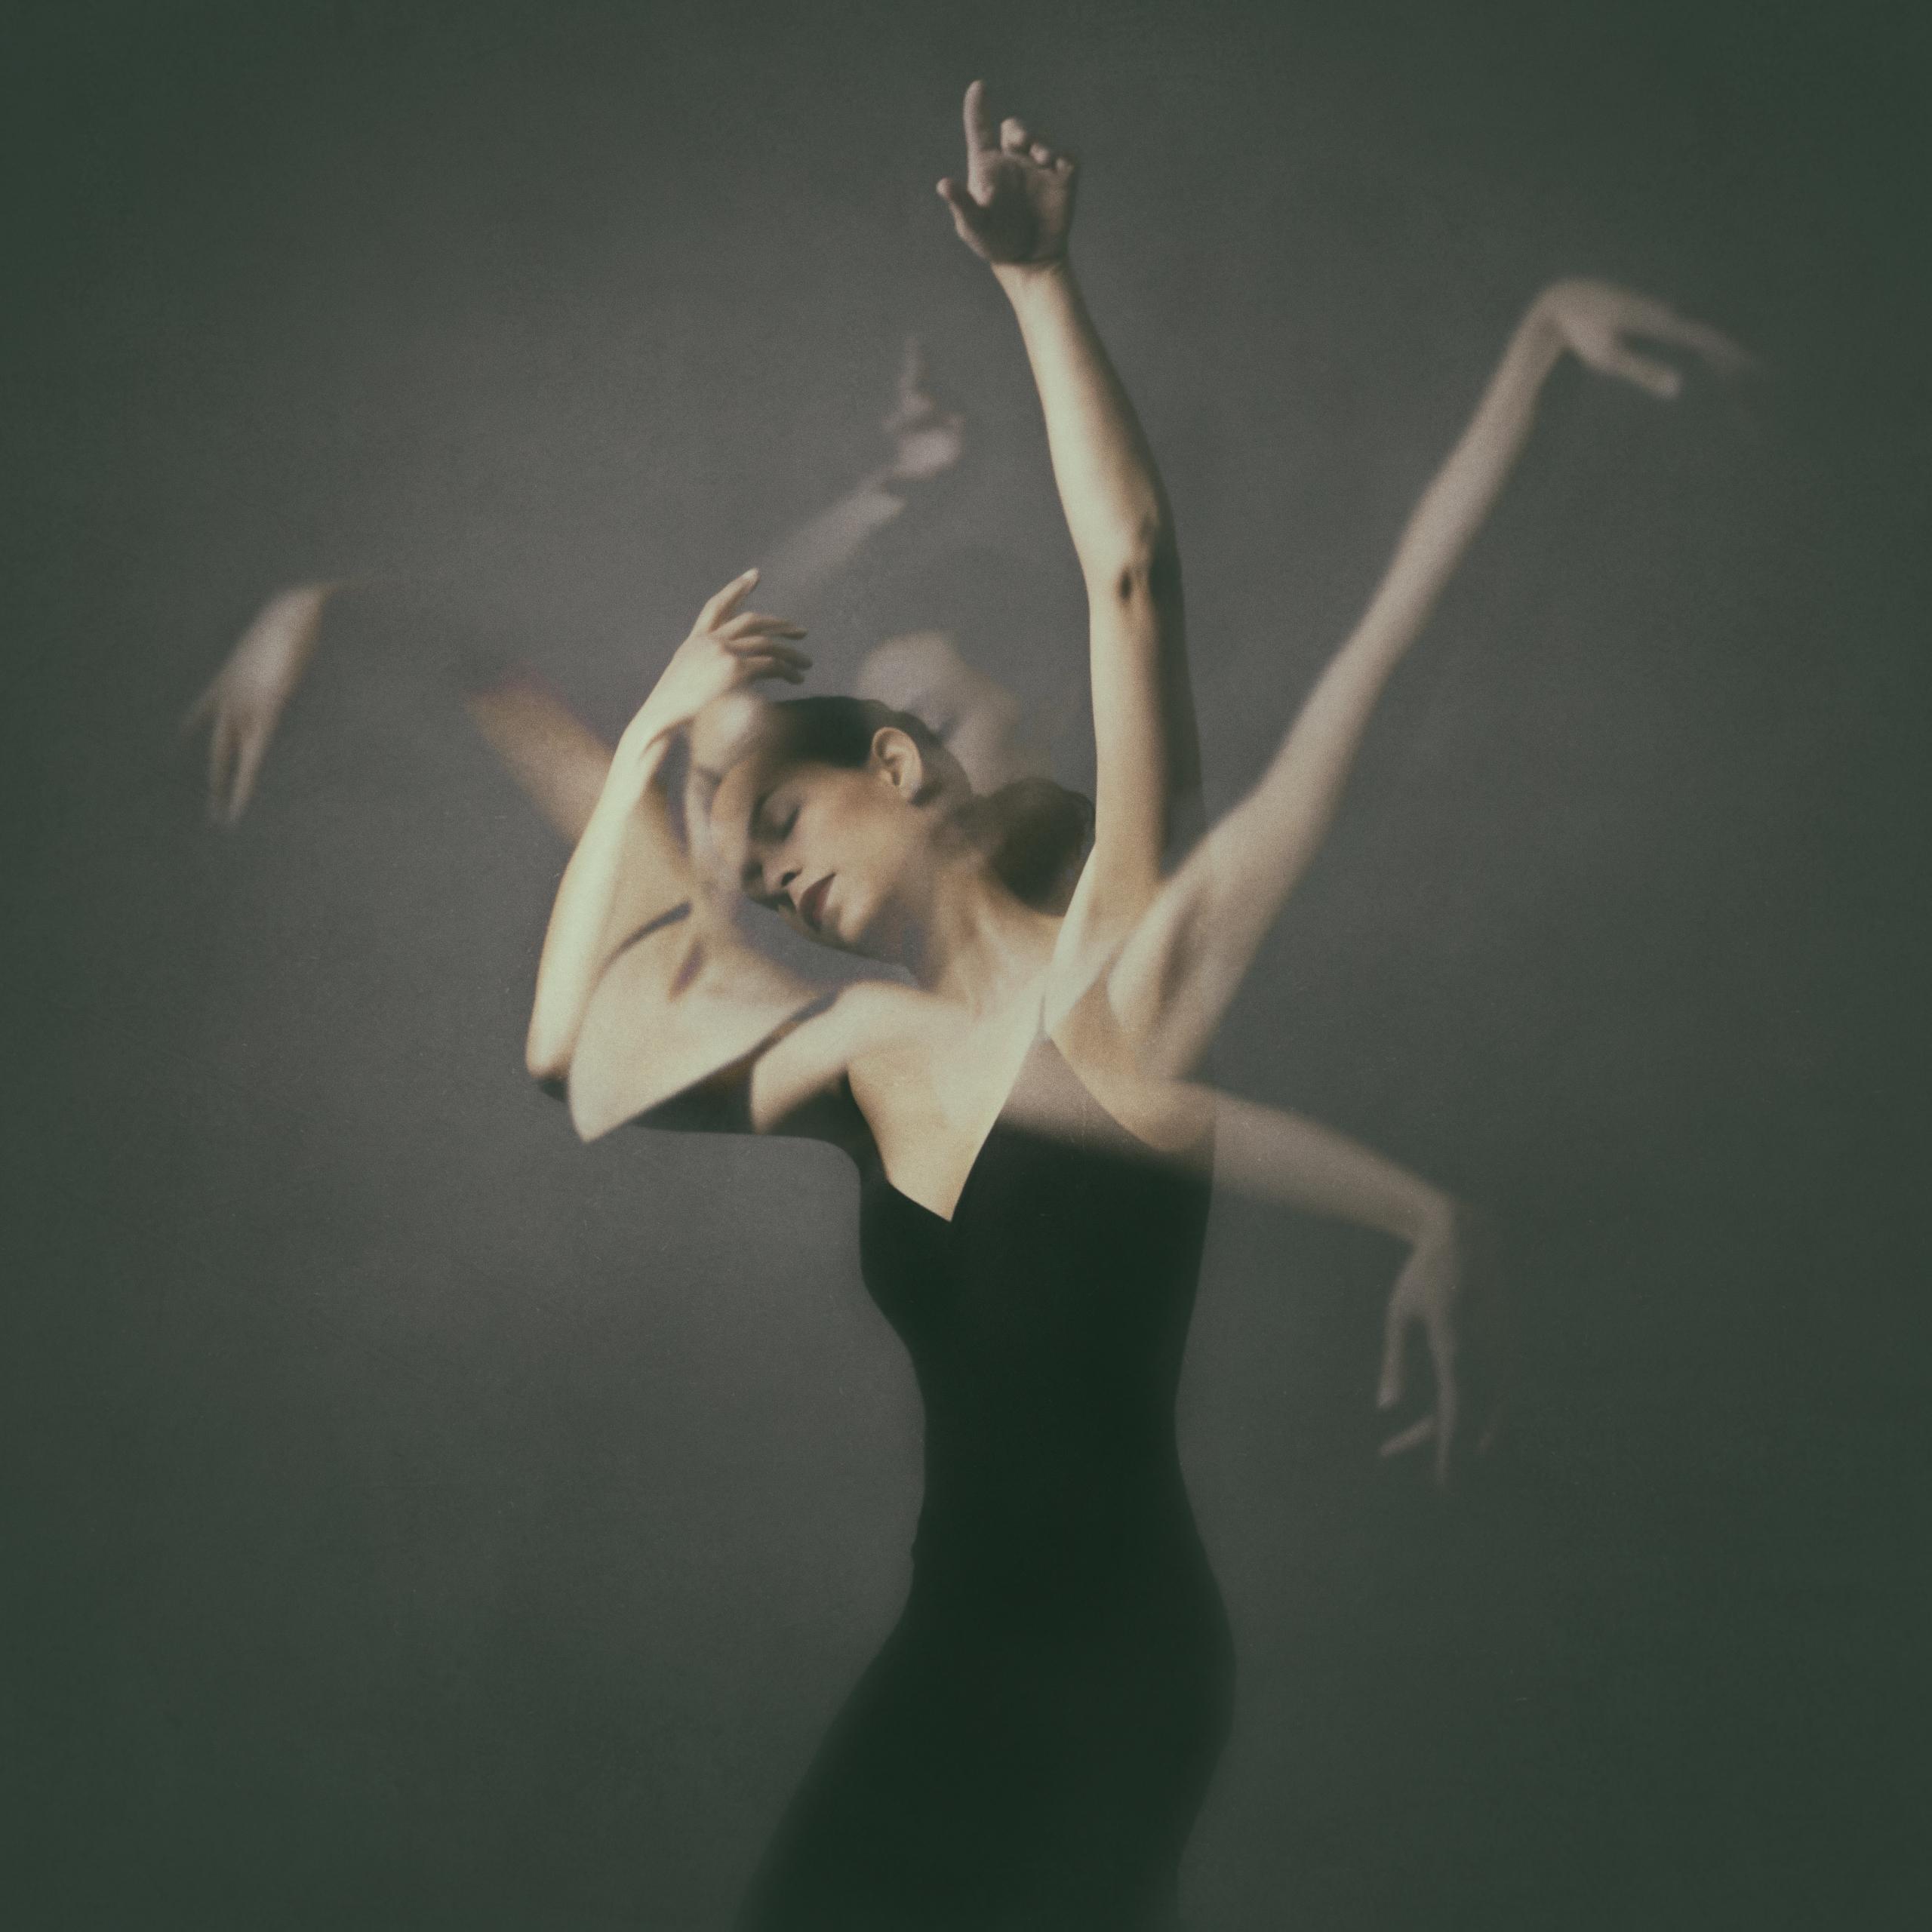 ― Lao Tzu - art, fineart, conceptual - cardinphotography | ello